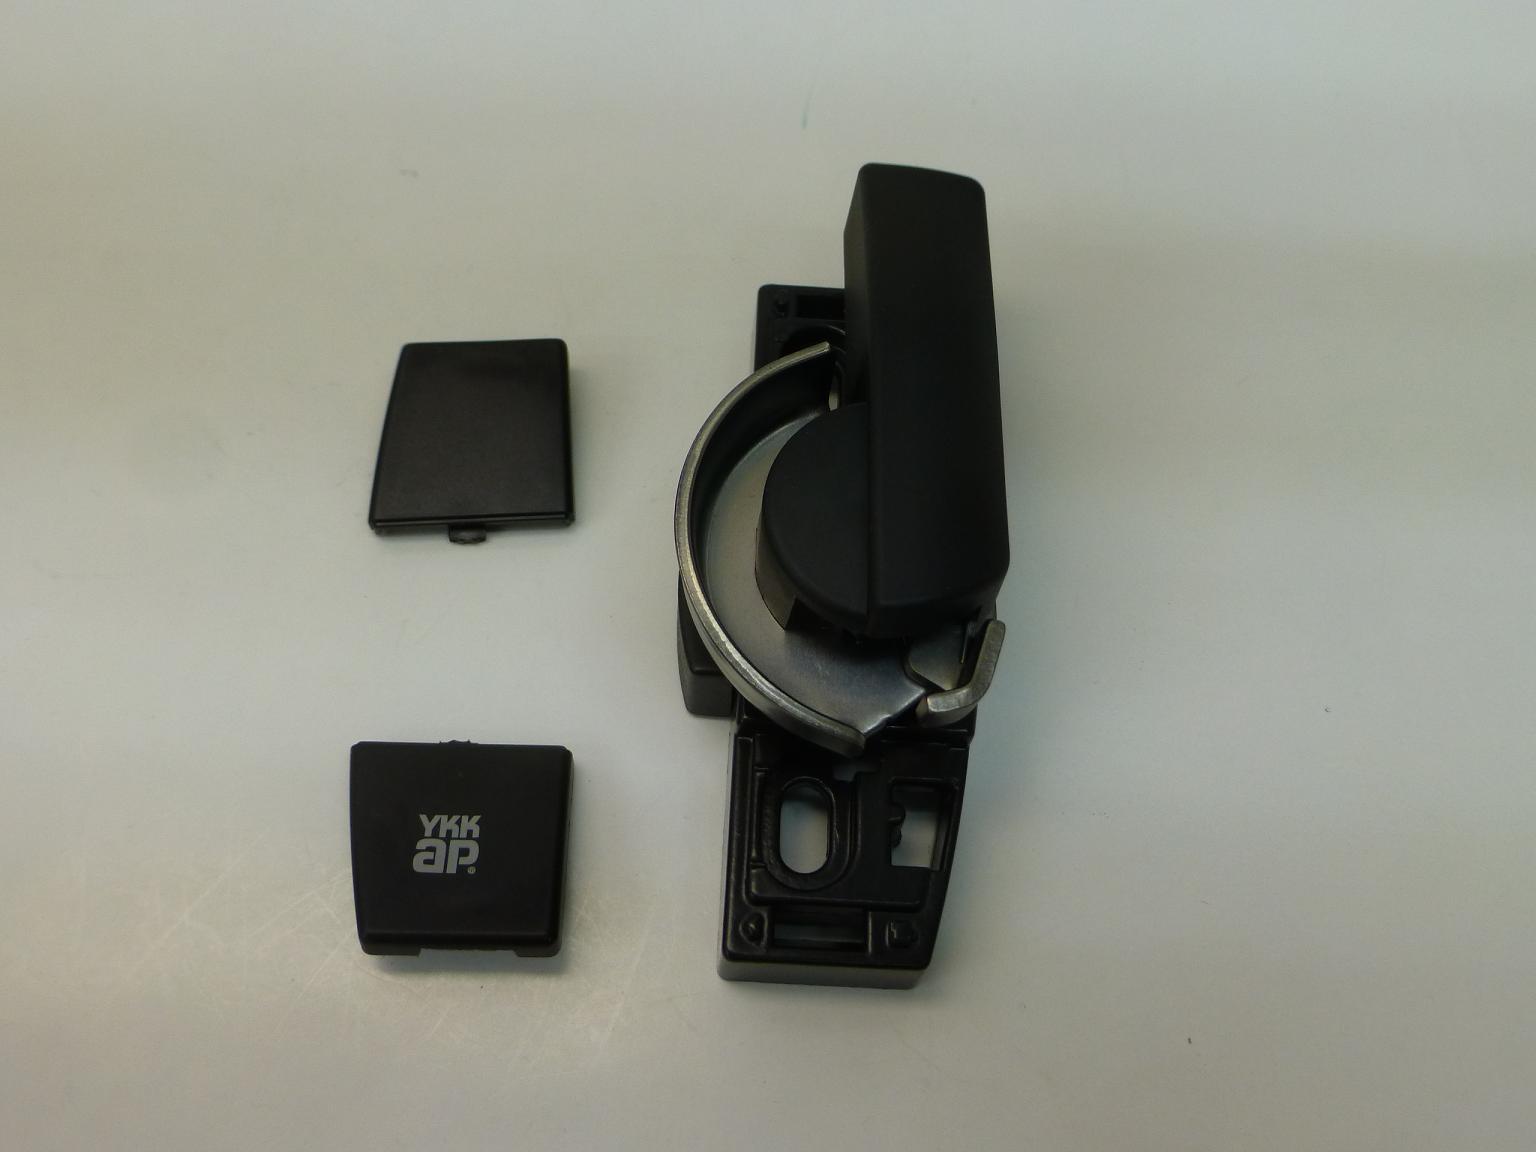 HH5K-11482 右 ダークグレー 好評受付中 HHK12799.HHJ0850-2 購入 のクレセントのみ